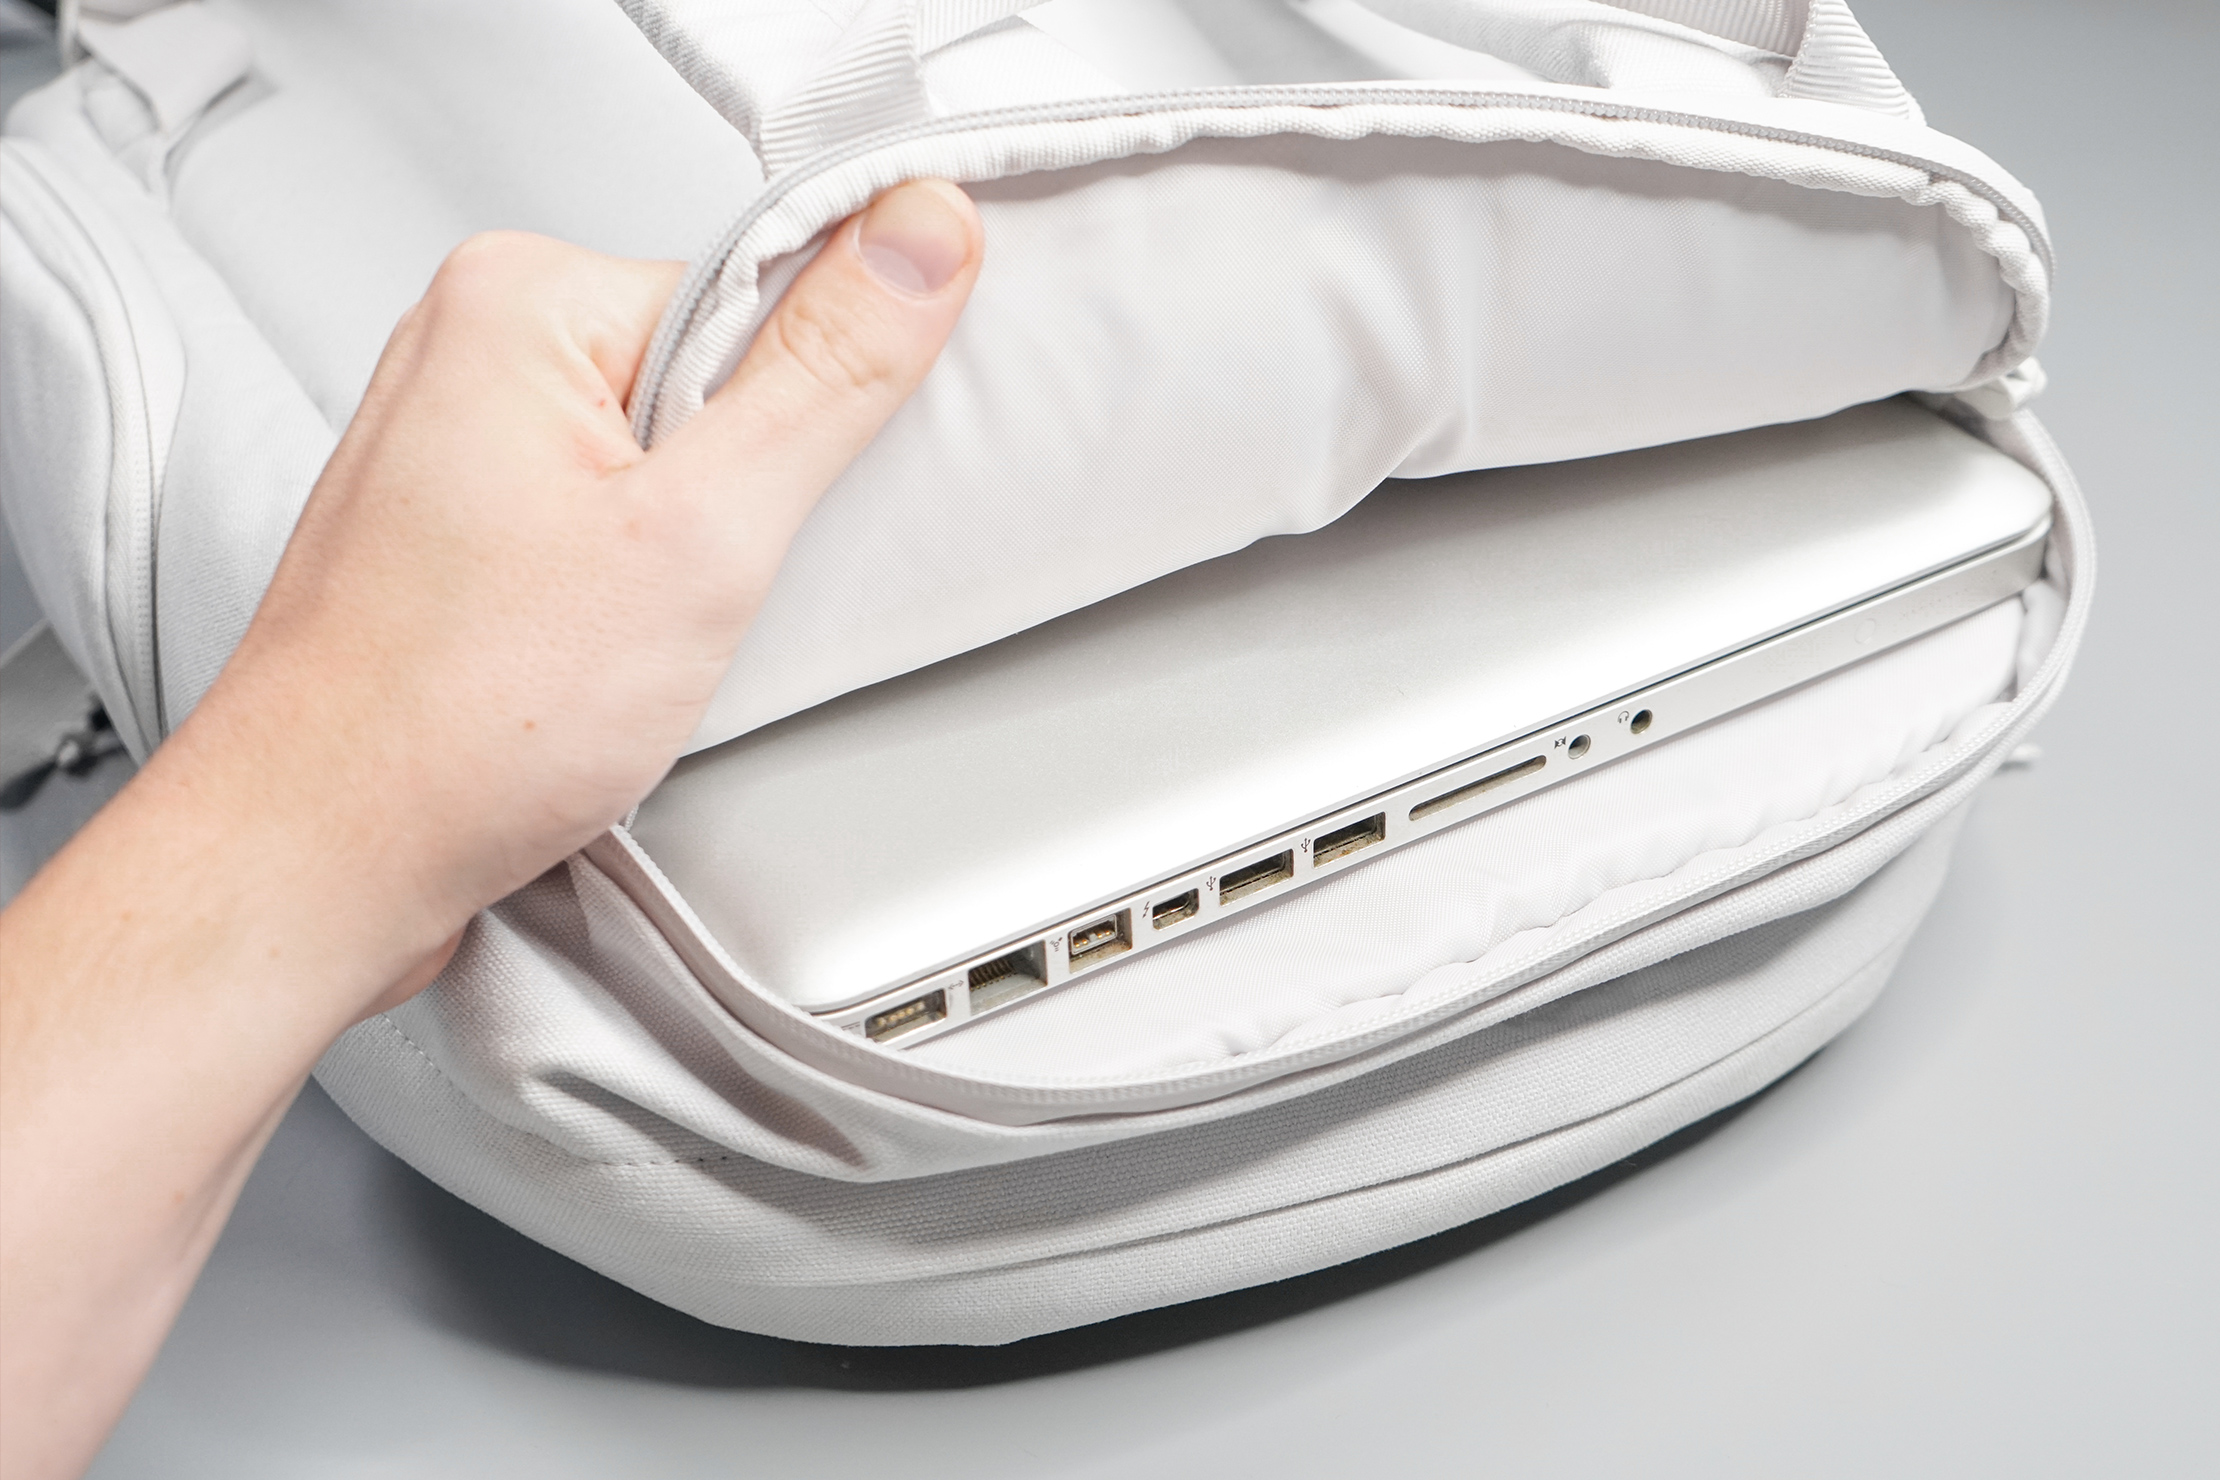 Brevitē Jumper Photo Backpack Laptop Compartment